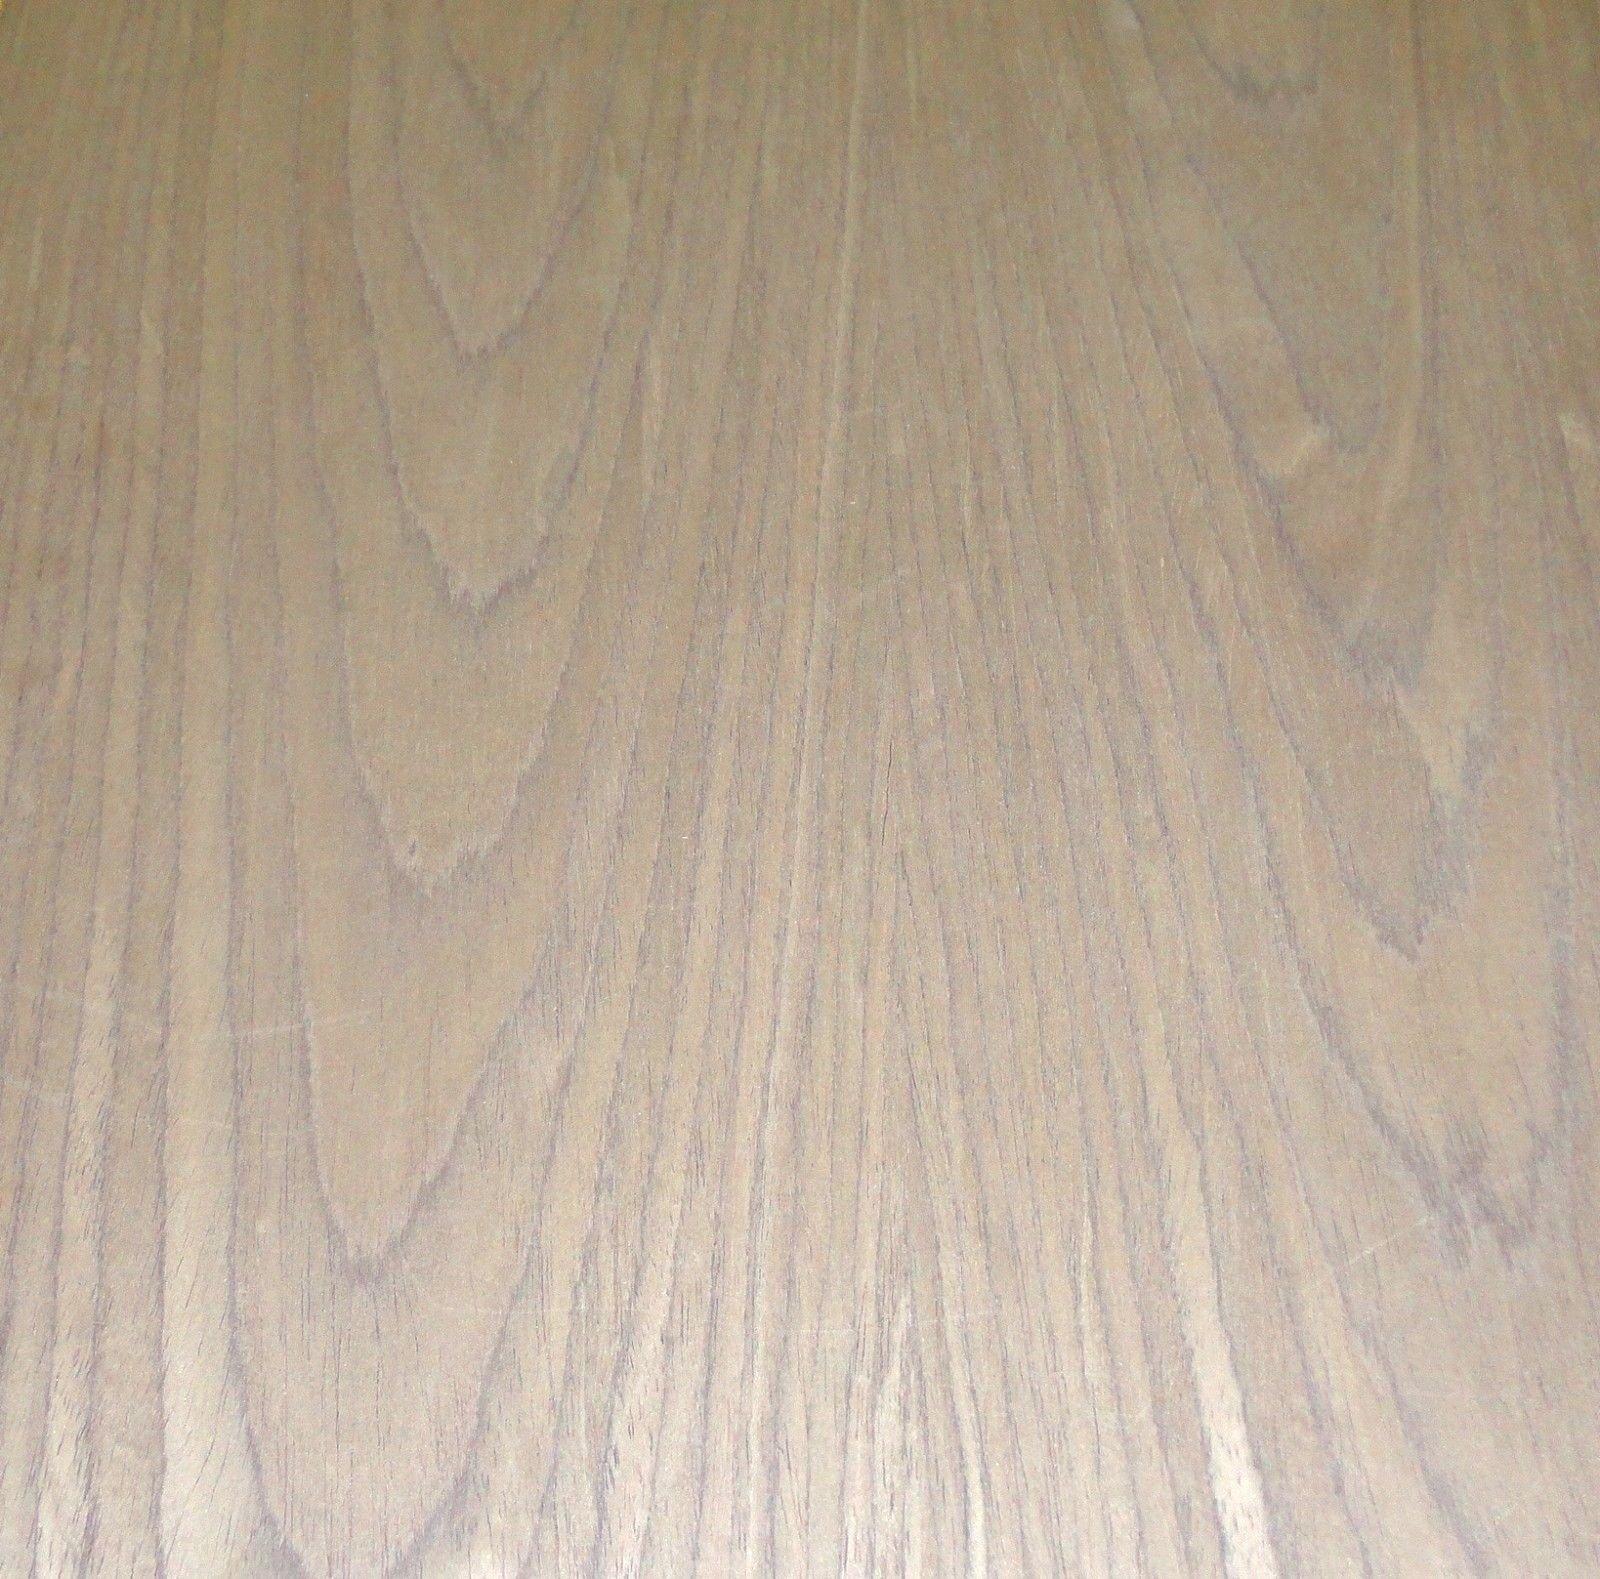 Walnut composite wood veneer 48'' x 96'' with paper backer Flat Cut 1/40'' (EFW)